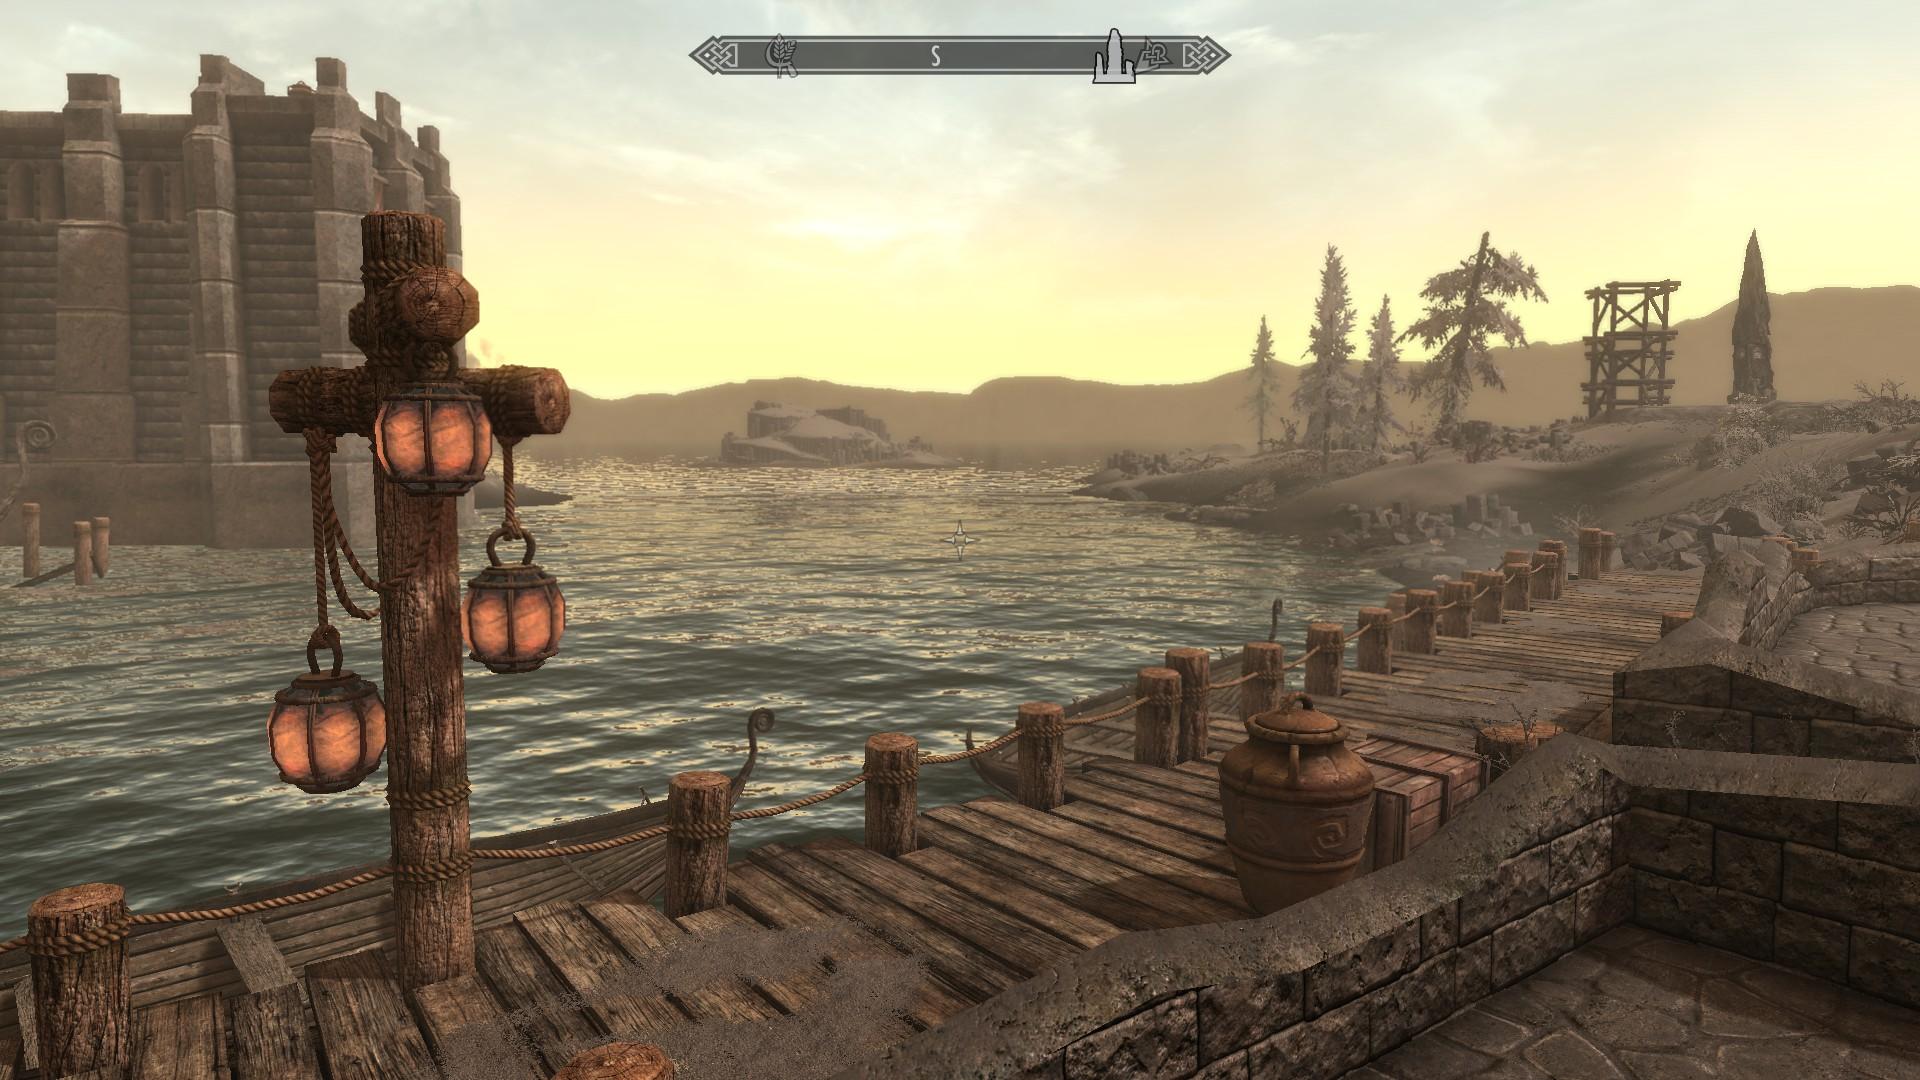 20180610114428_1.jpg - Elder Scrolls 5: Skyrim, the